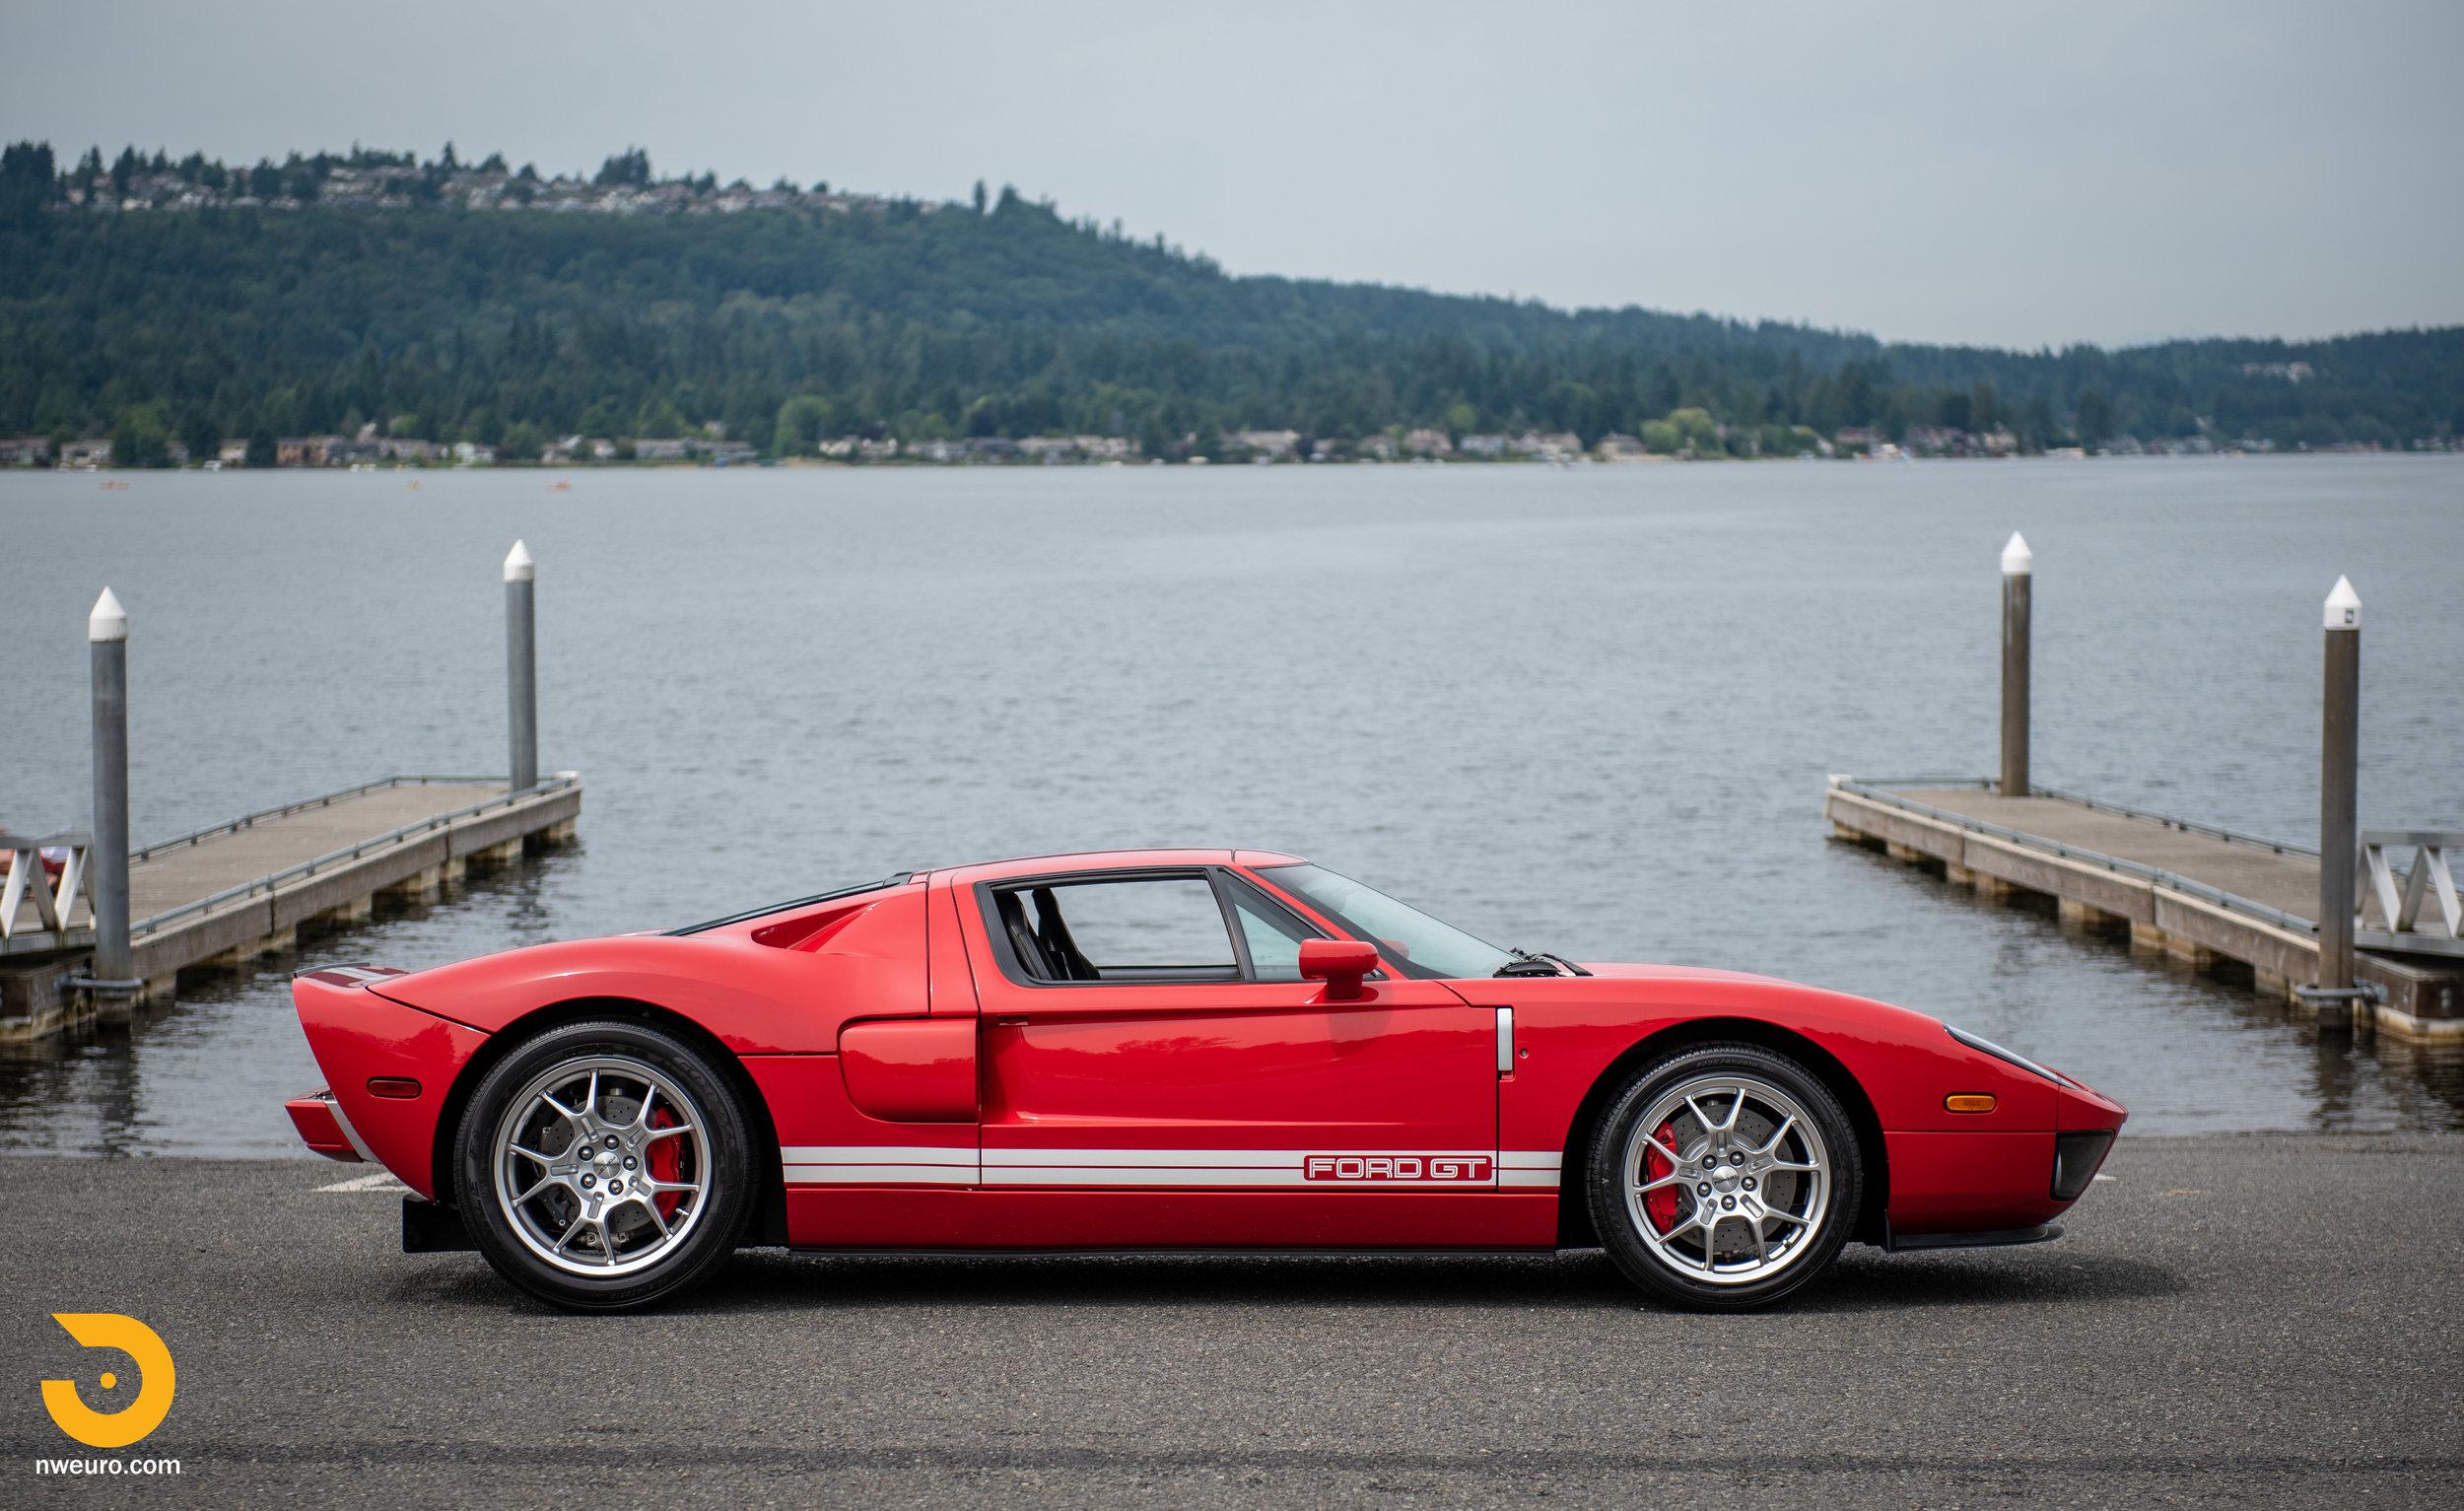 2005 Ford GT Red-1.jpg